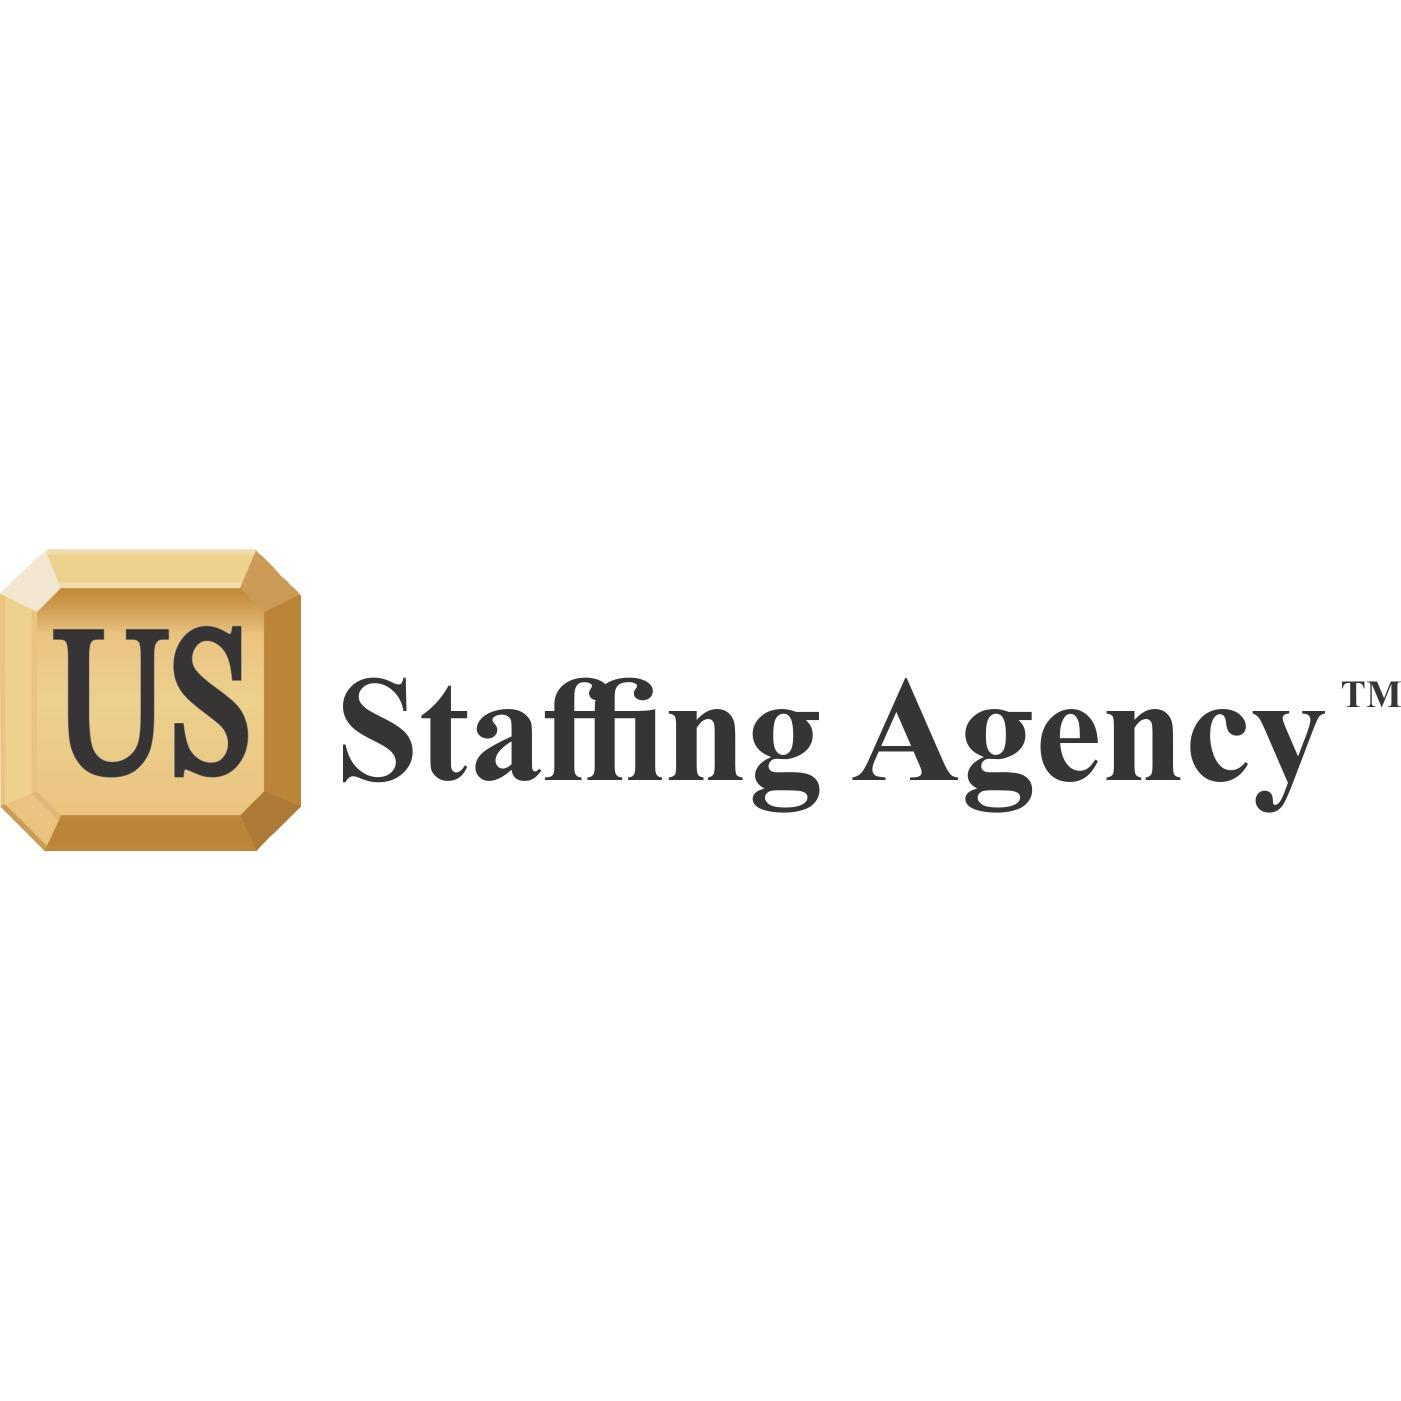 U.S. Staffing Agency - Clarksville, TN 37042 - (931)542-3816 | ShowMeLocal.com